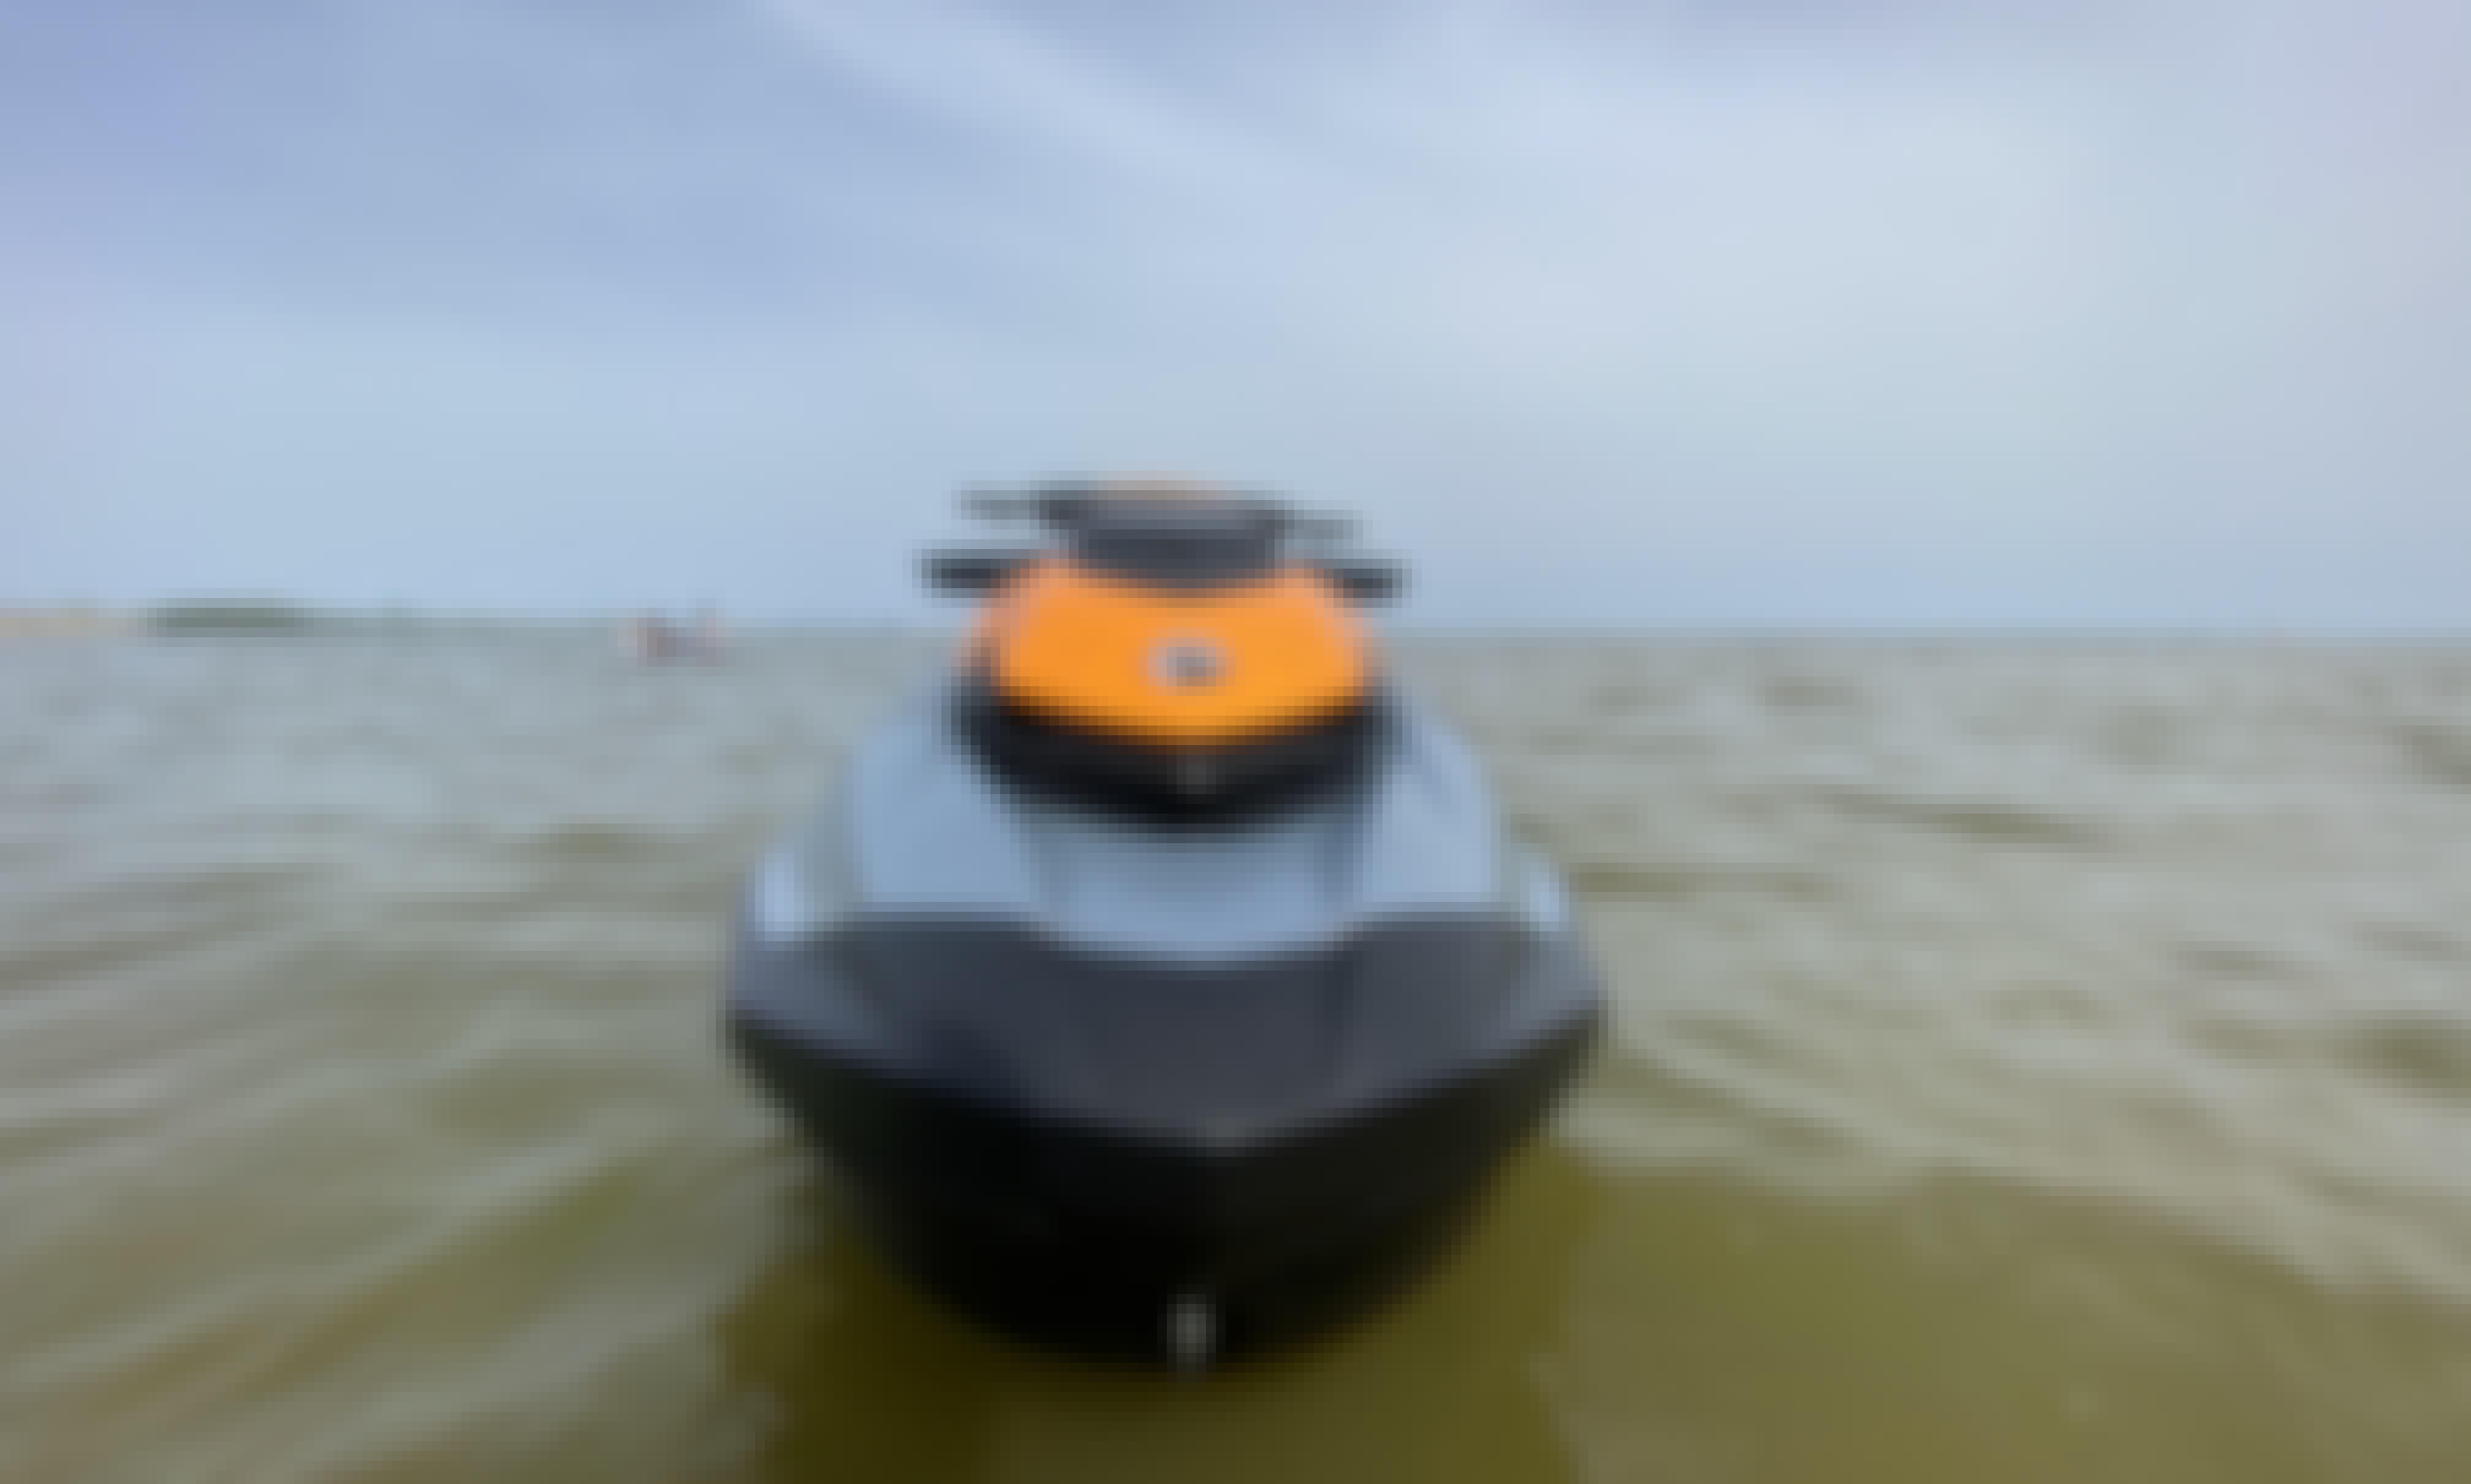 Brandnew Sea Doo Jet Ski for Adrenaline Cravers! Ready for any lake in Orlando, Florida